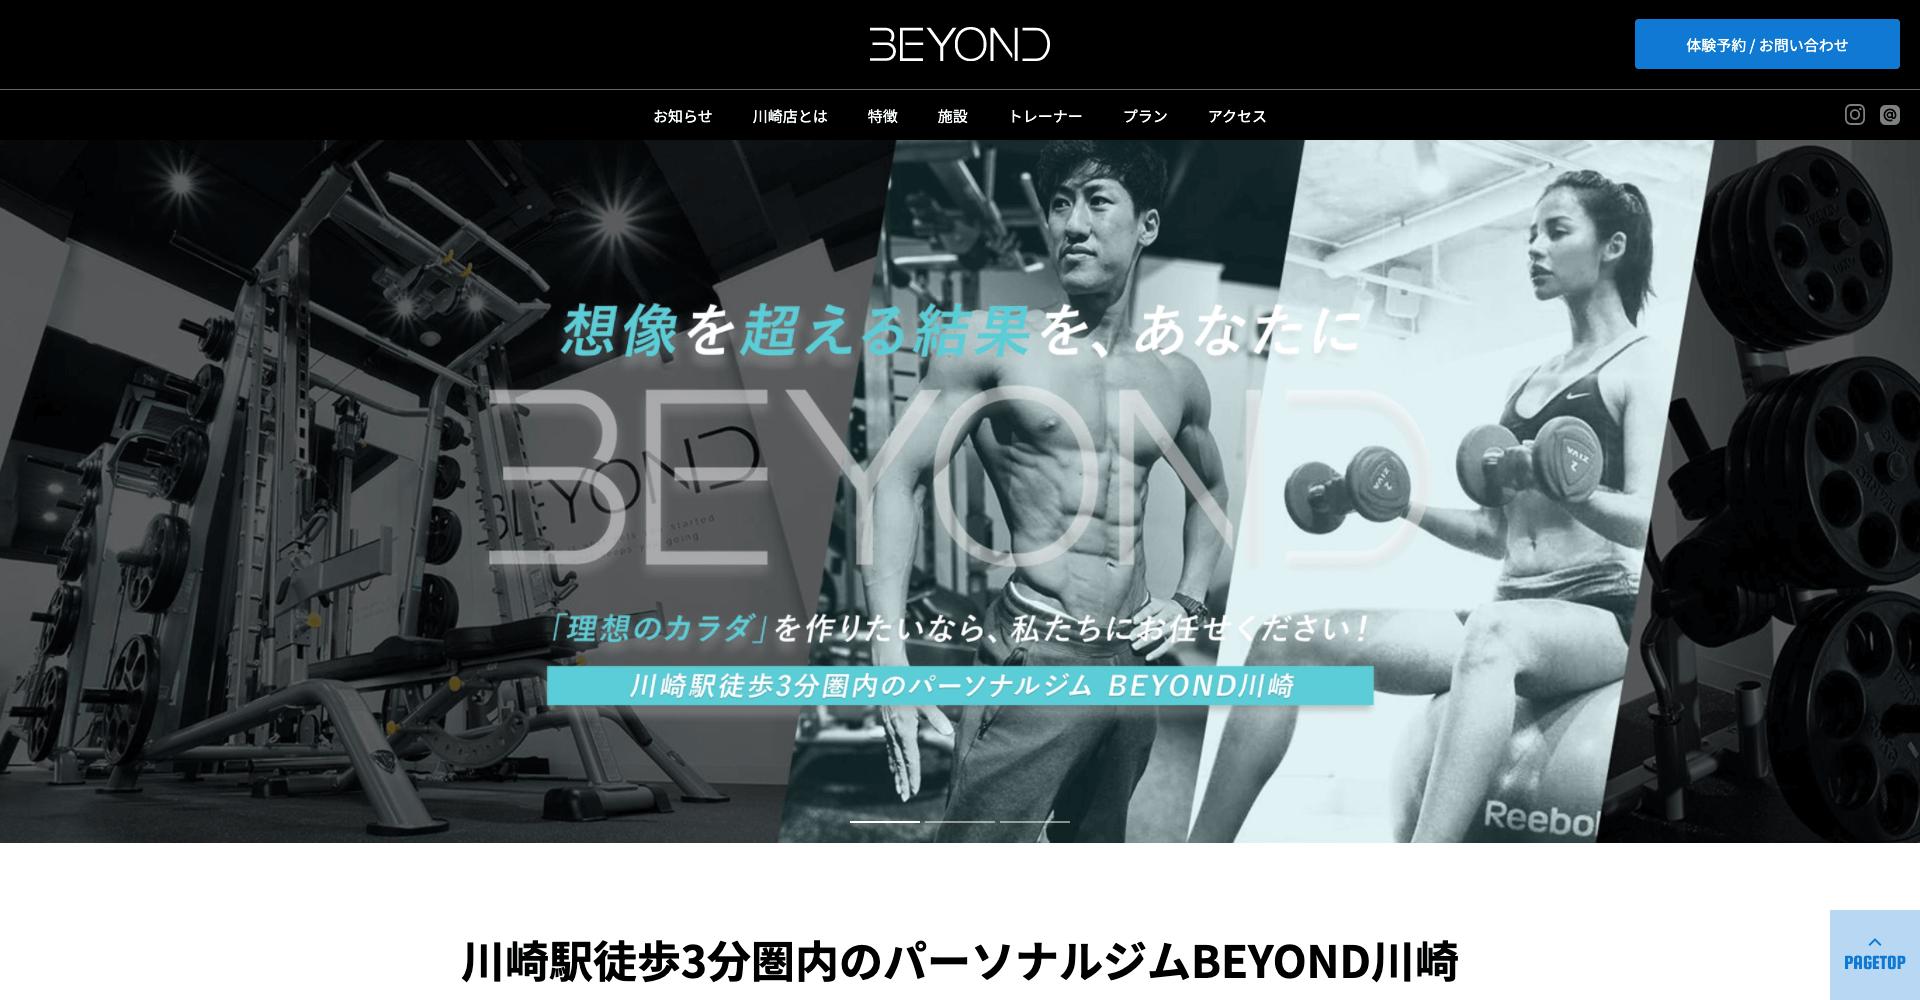 BEYOND(ビヨンド)ジム 川崎店